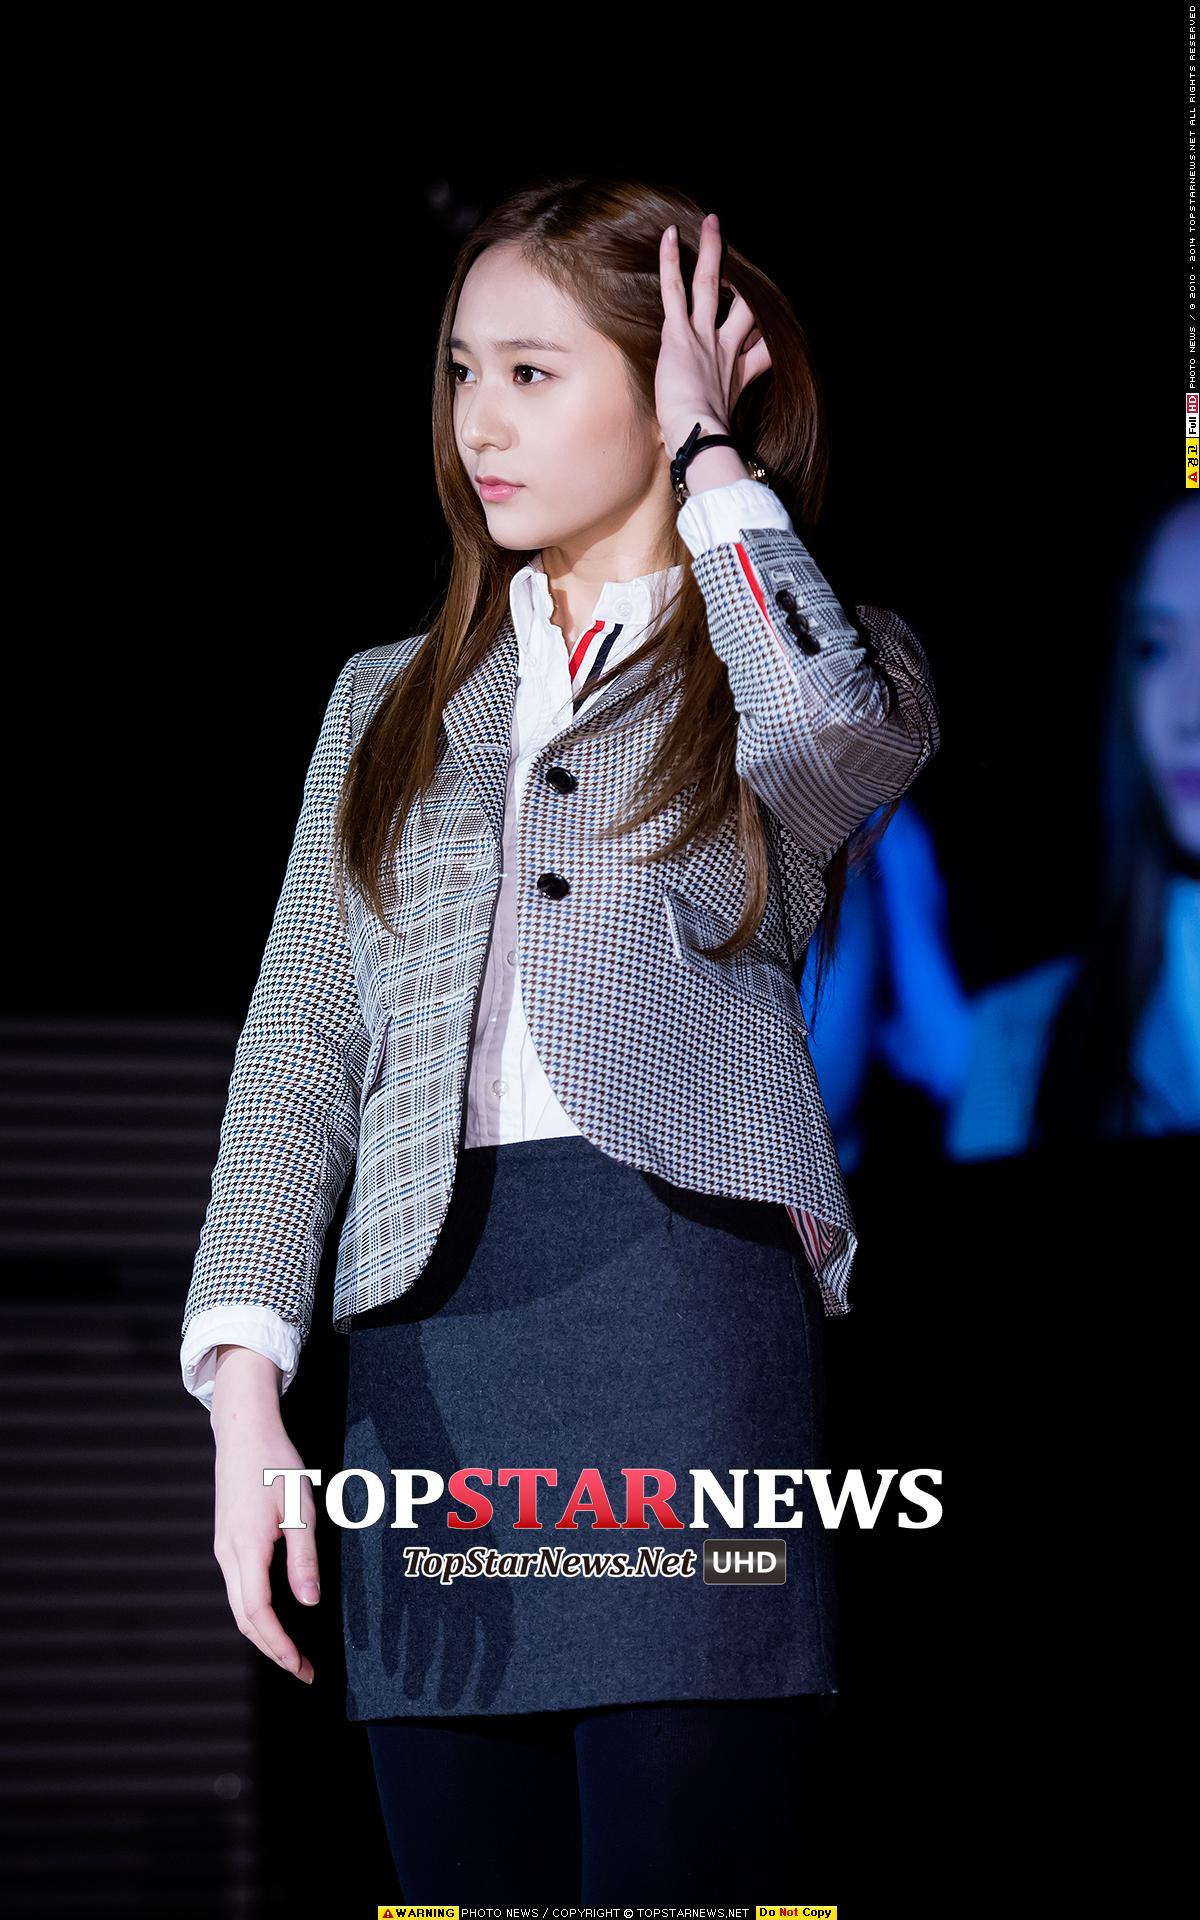 3.Krystal 這樣撩髮不只女生覺得Krystal超美,連男生也受不了吧~~